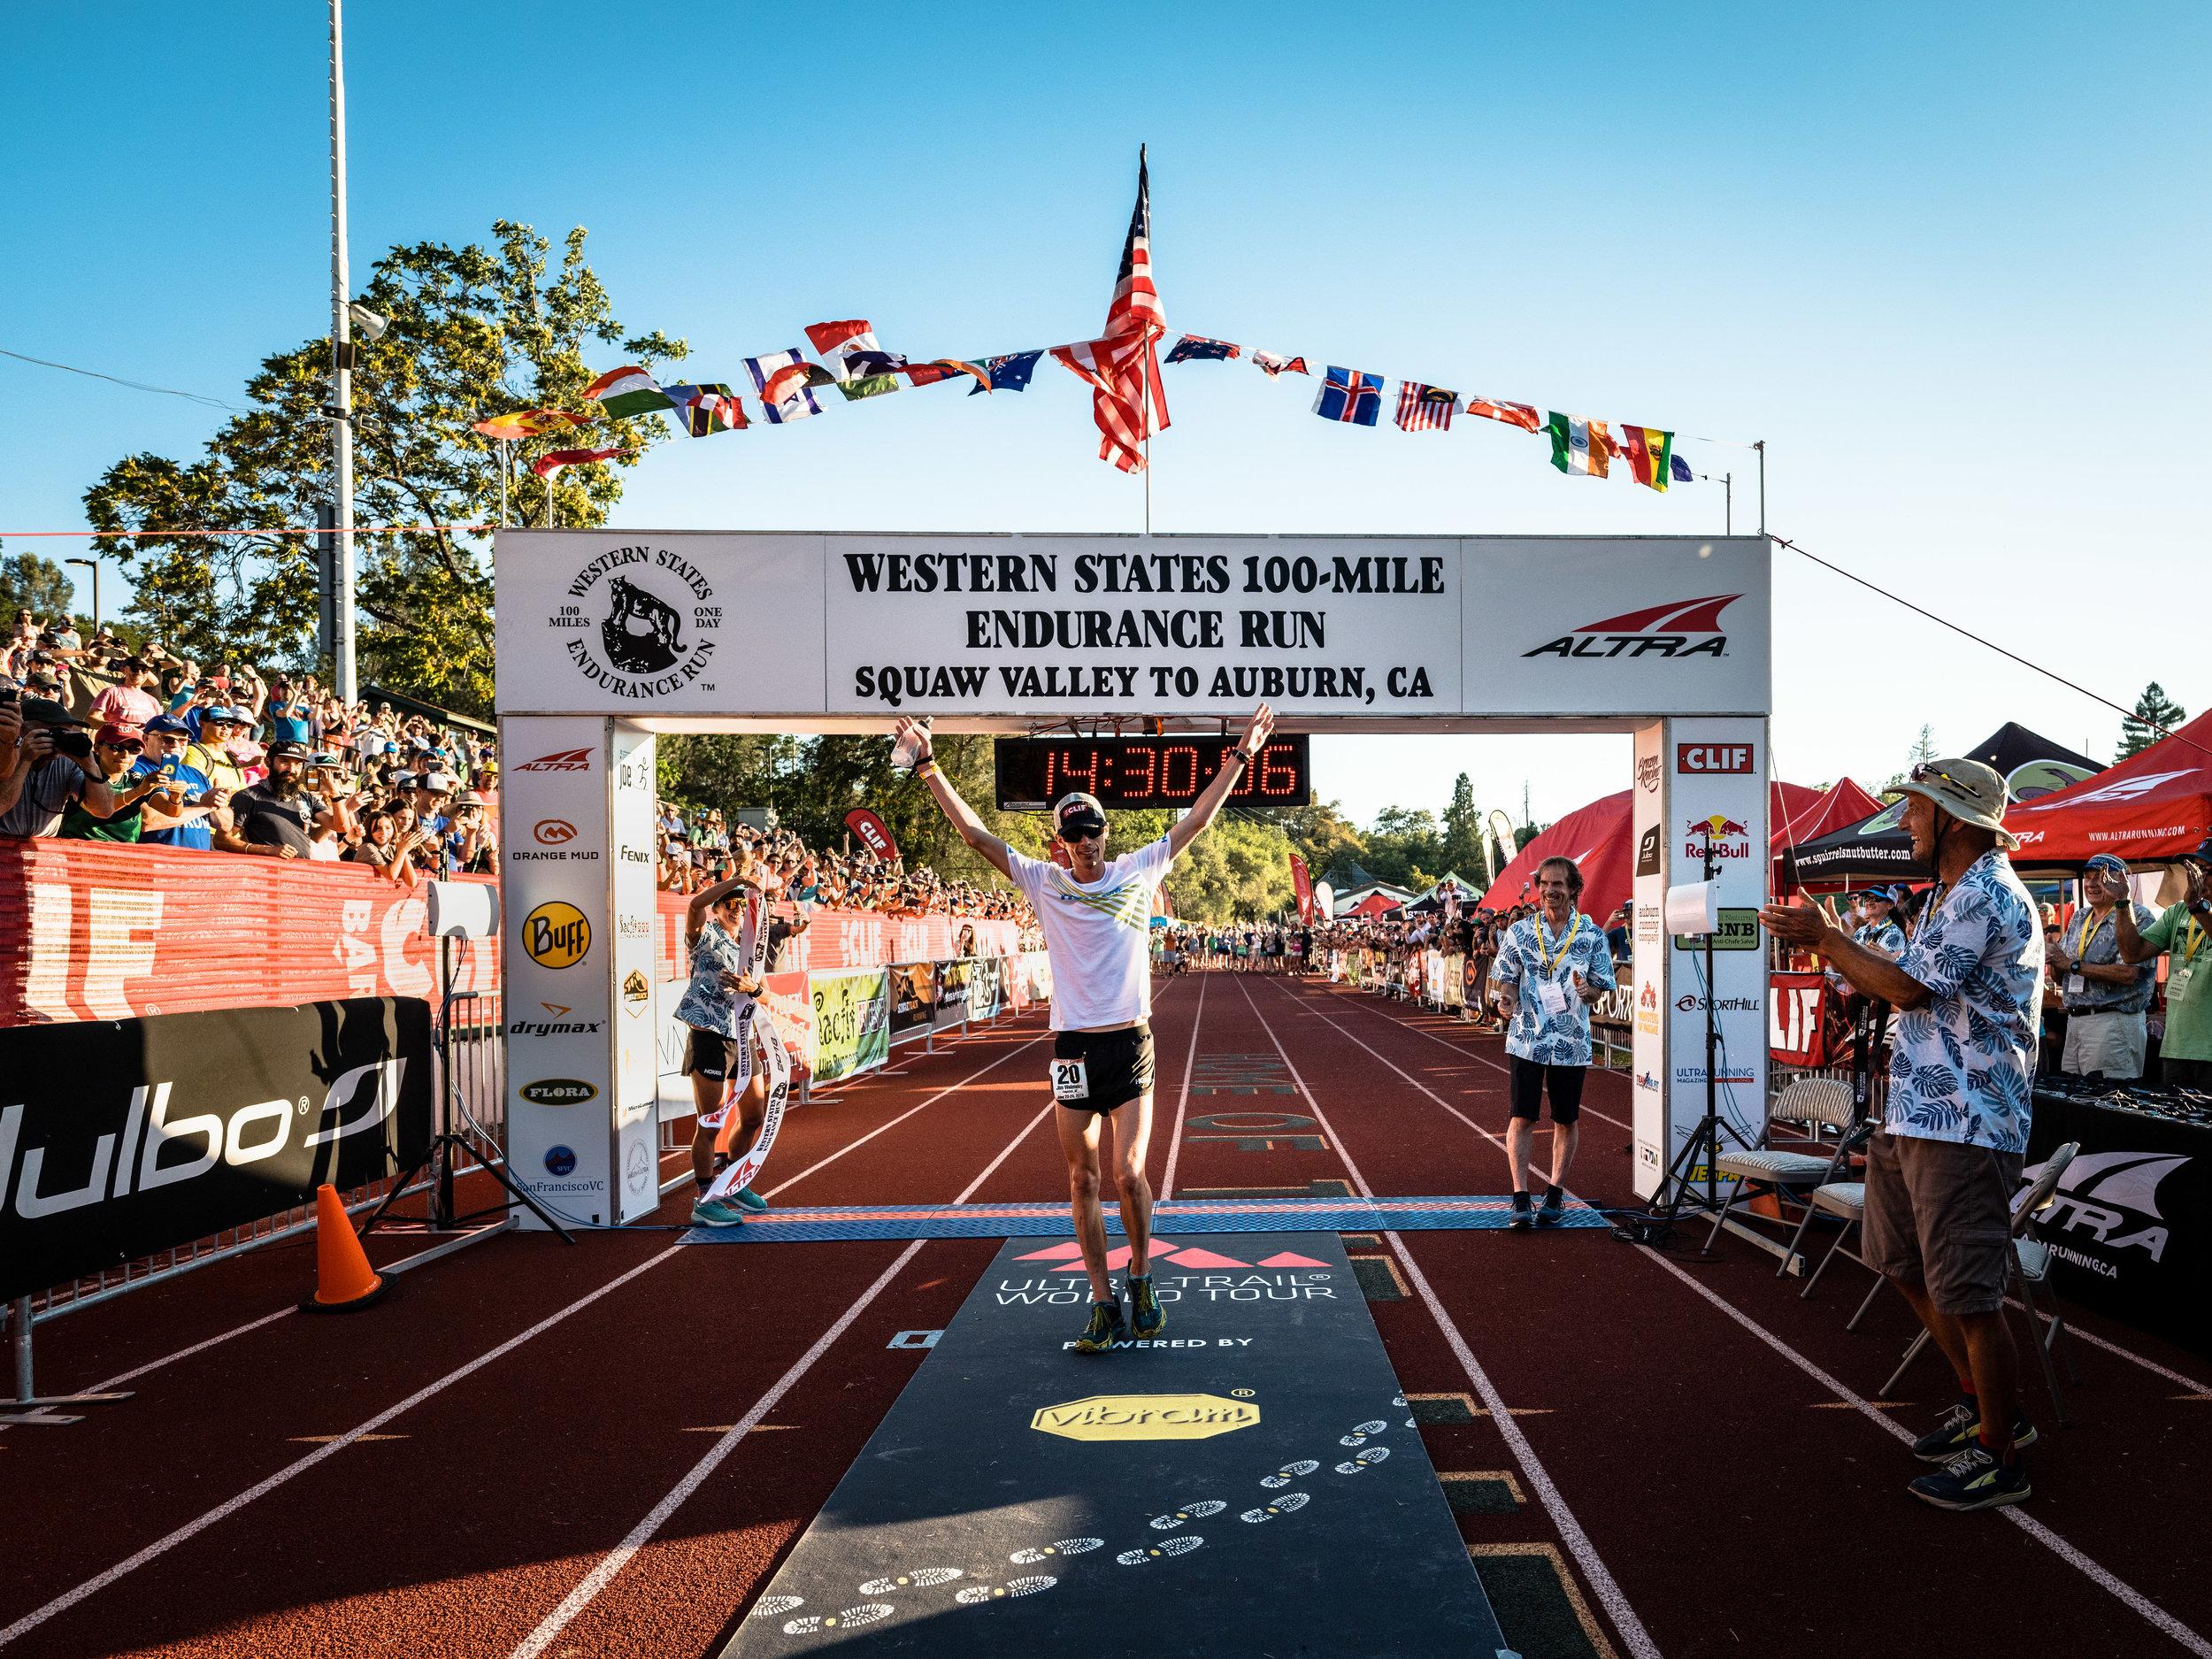 Jim Walmsley_Finish Line_Celebration_Western States_Ryland West.jpg